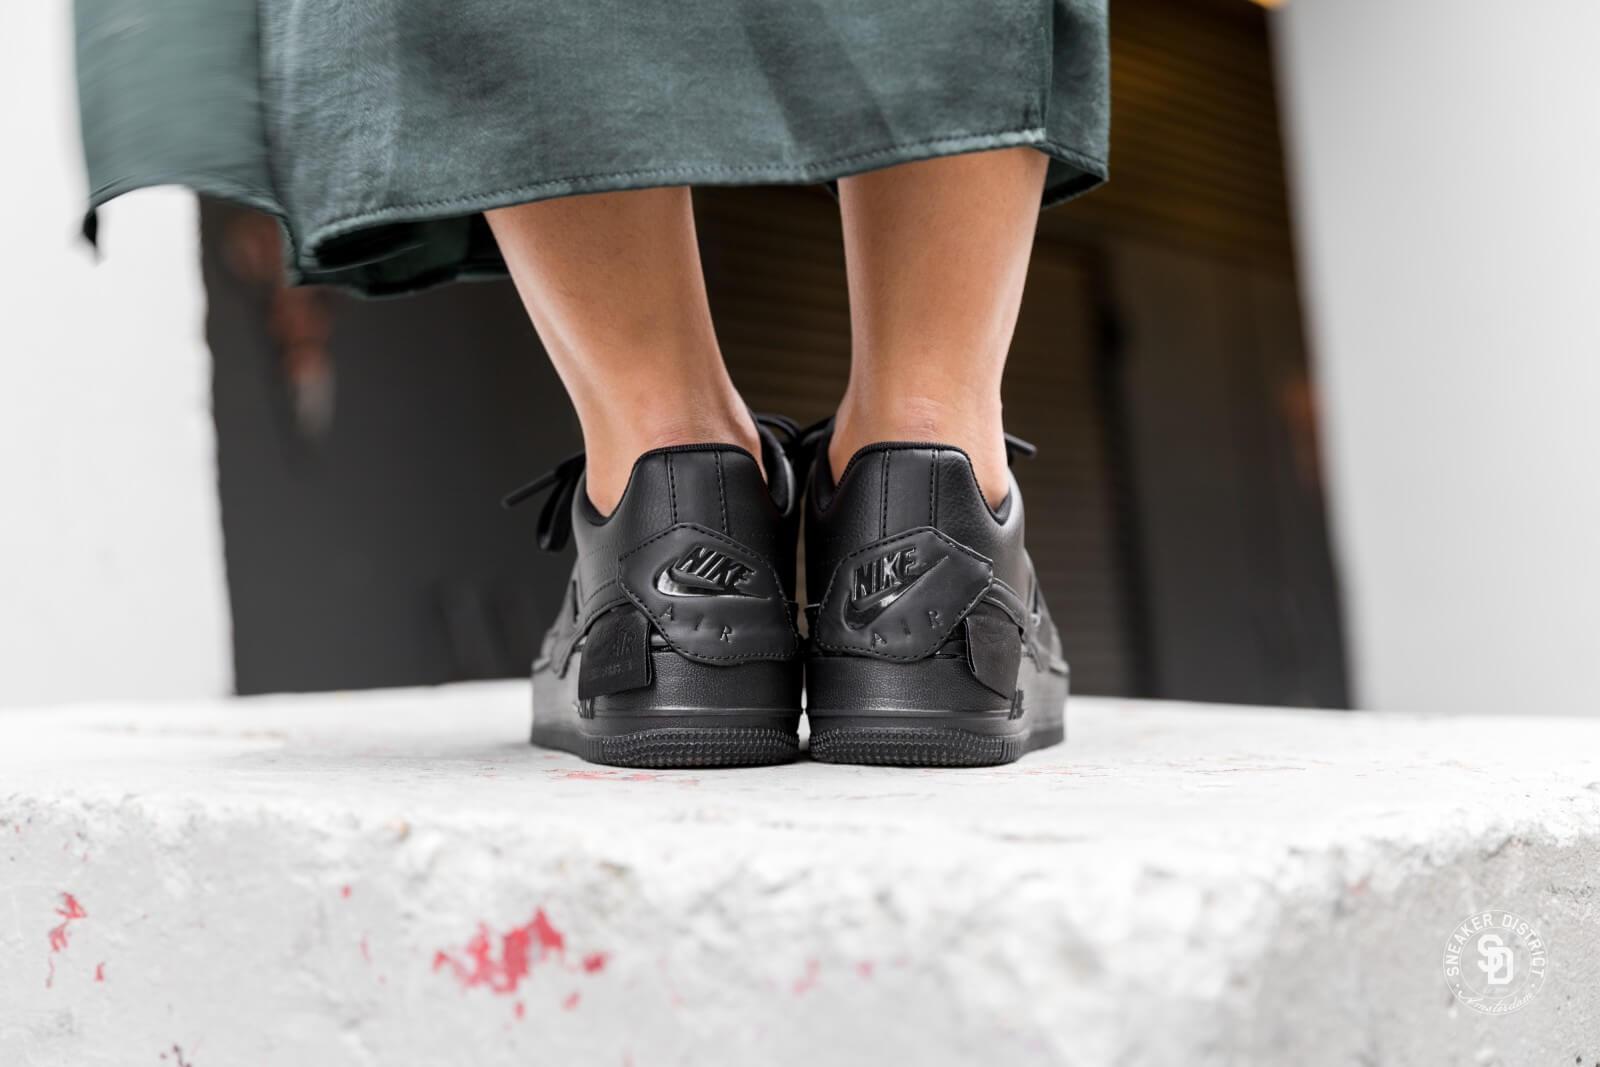 Nike Air Force 1 Jester XX BlackBlack AO1220 001